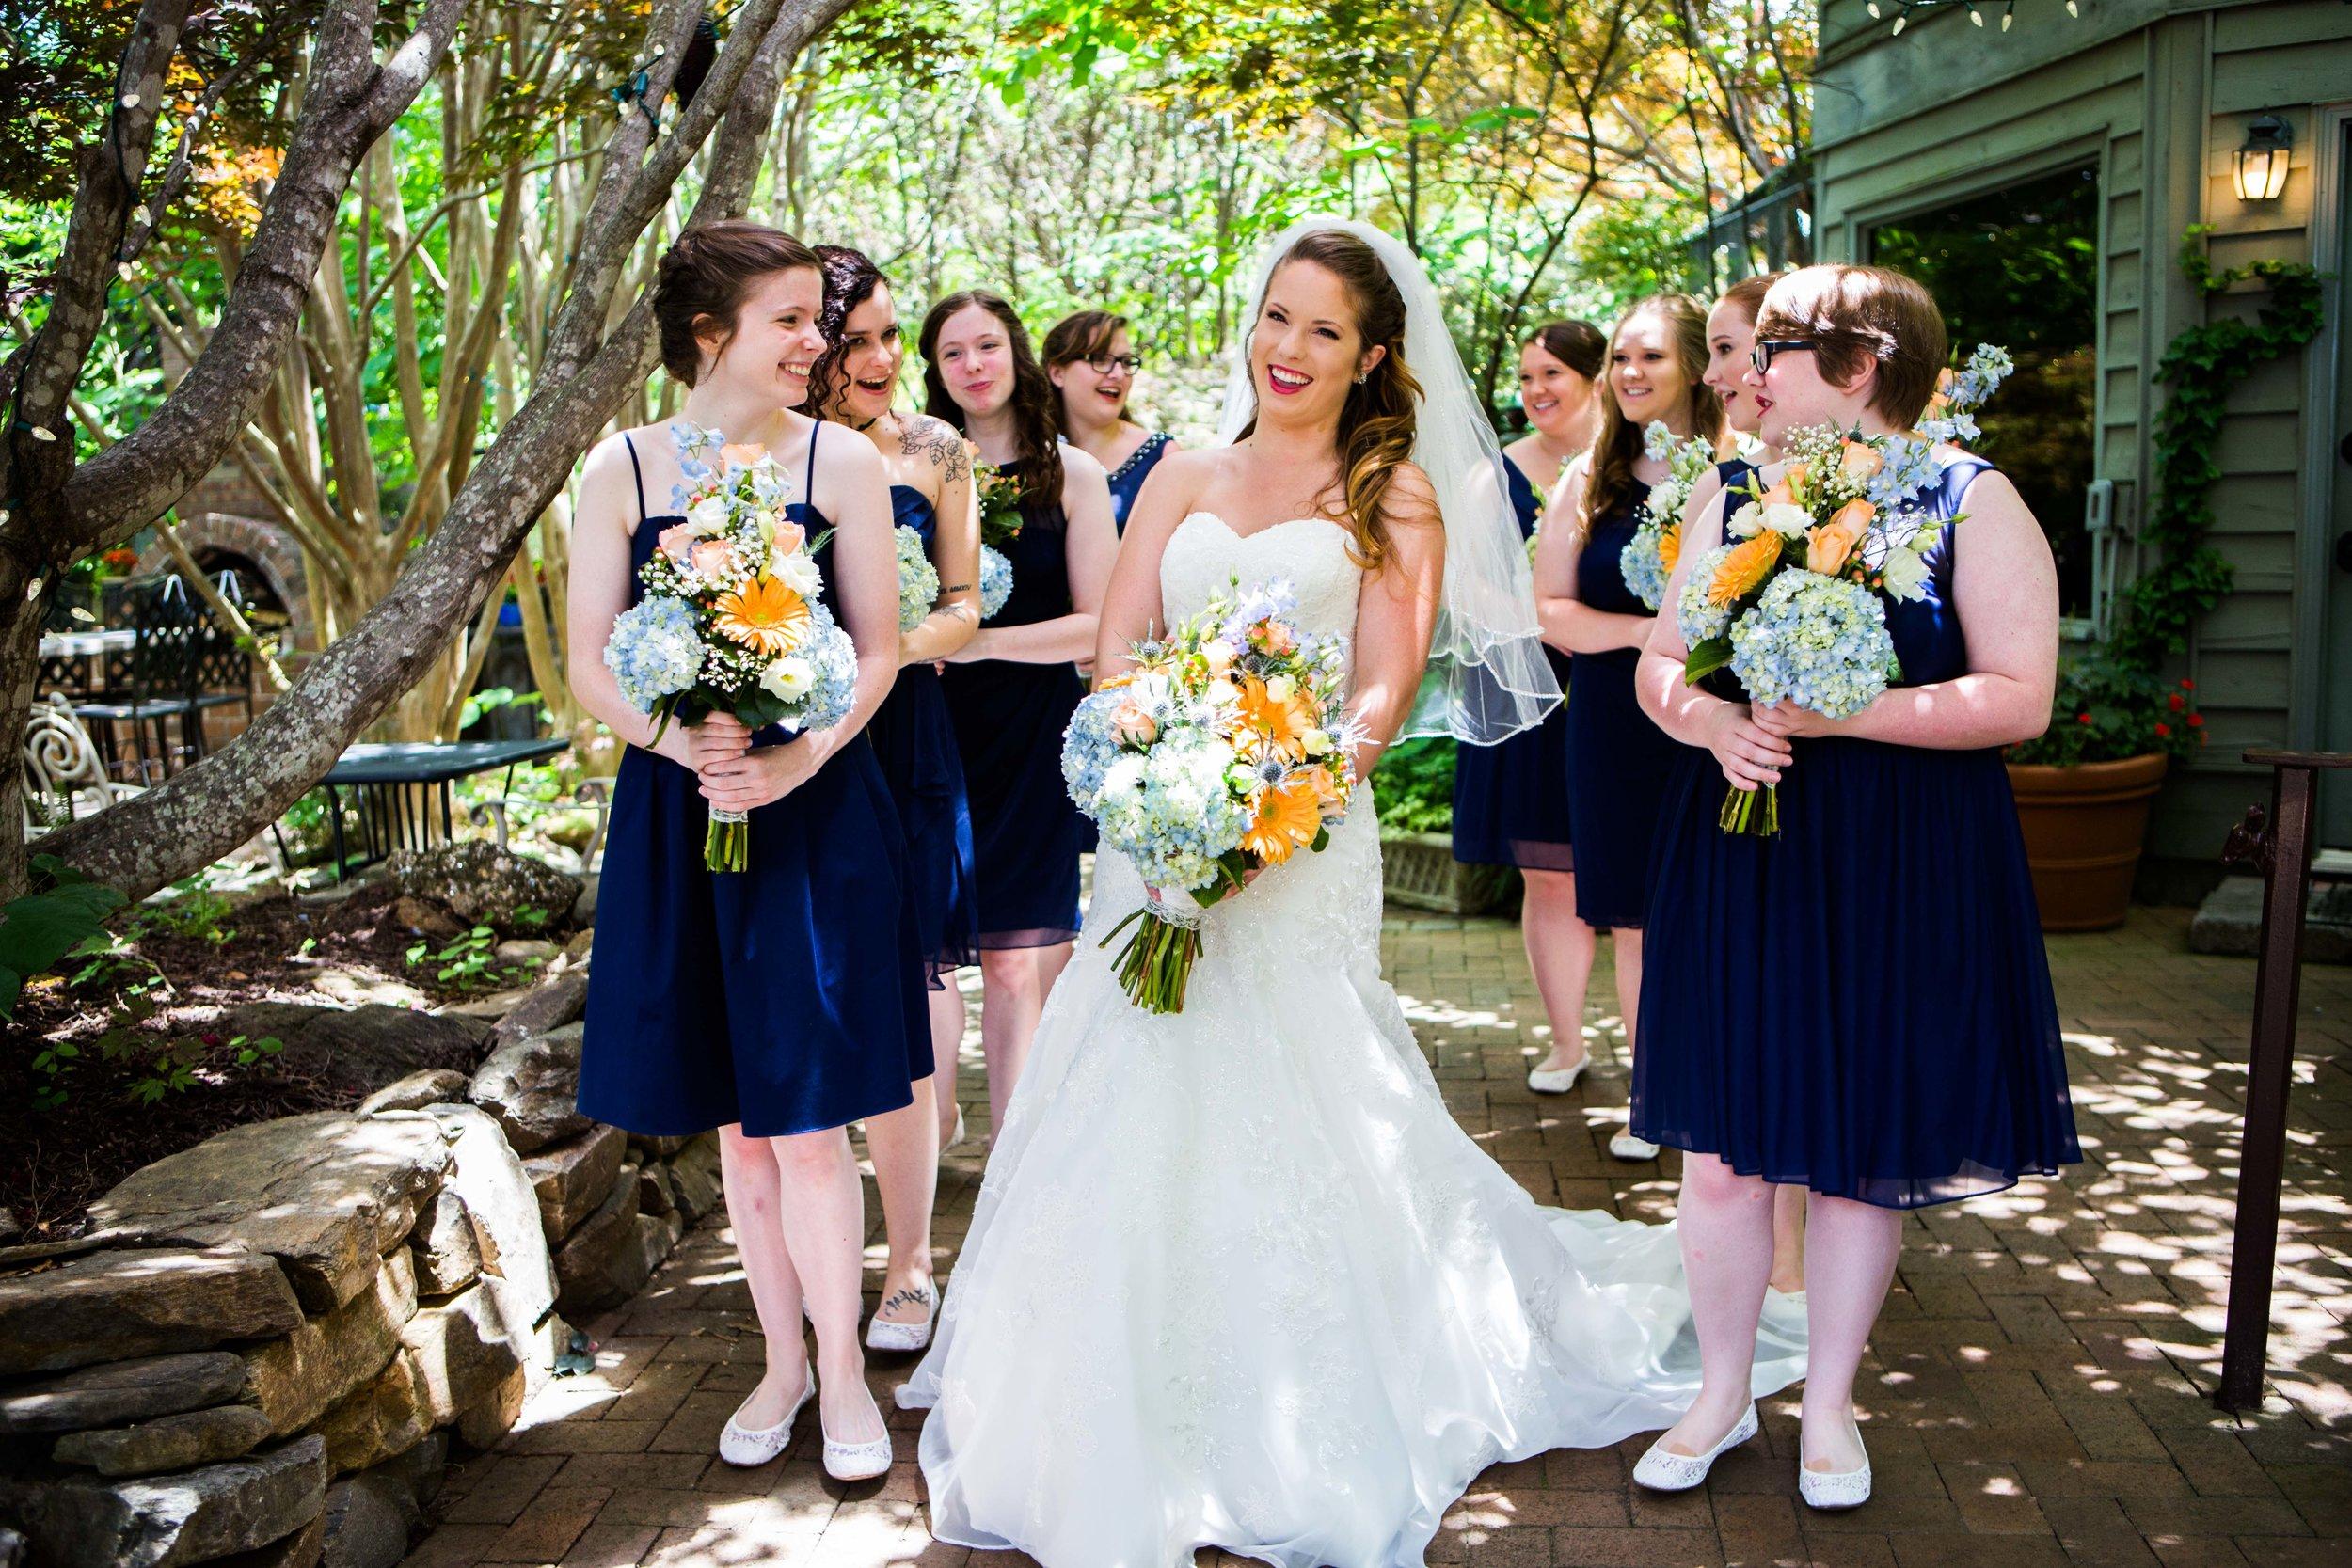 060416_Norris_Smith_Wedding_CF_1753.jpg